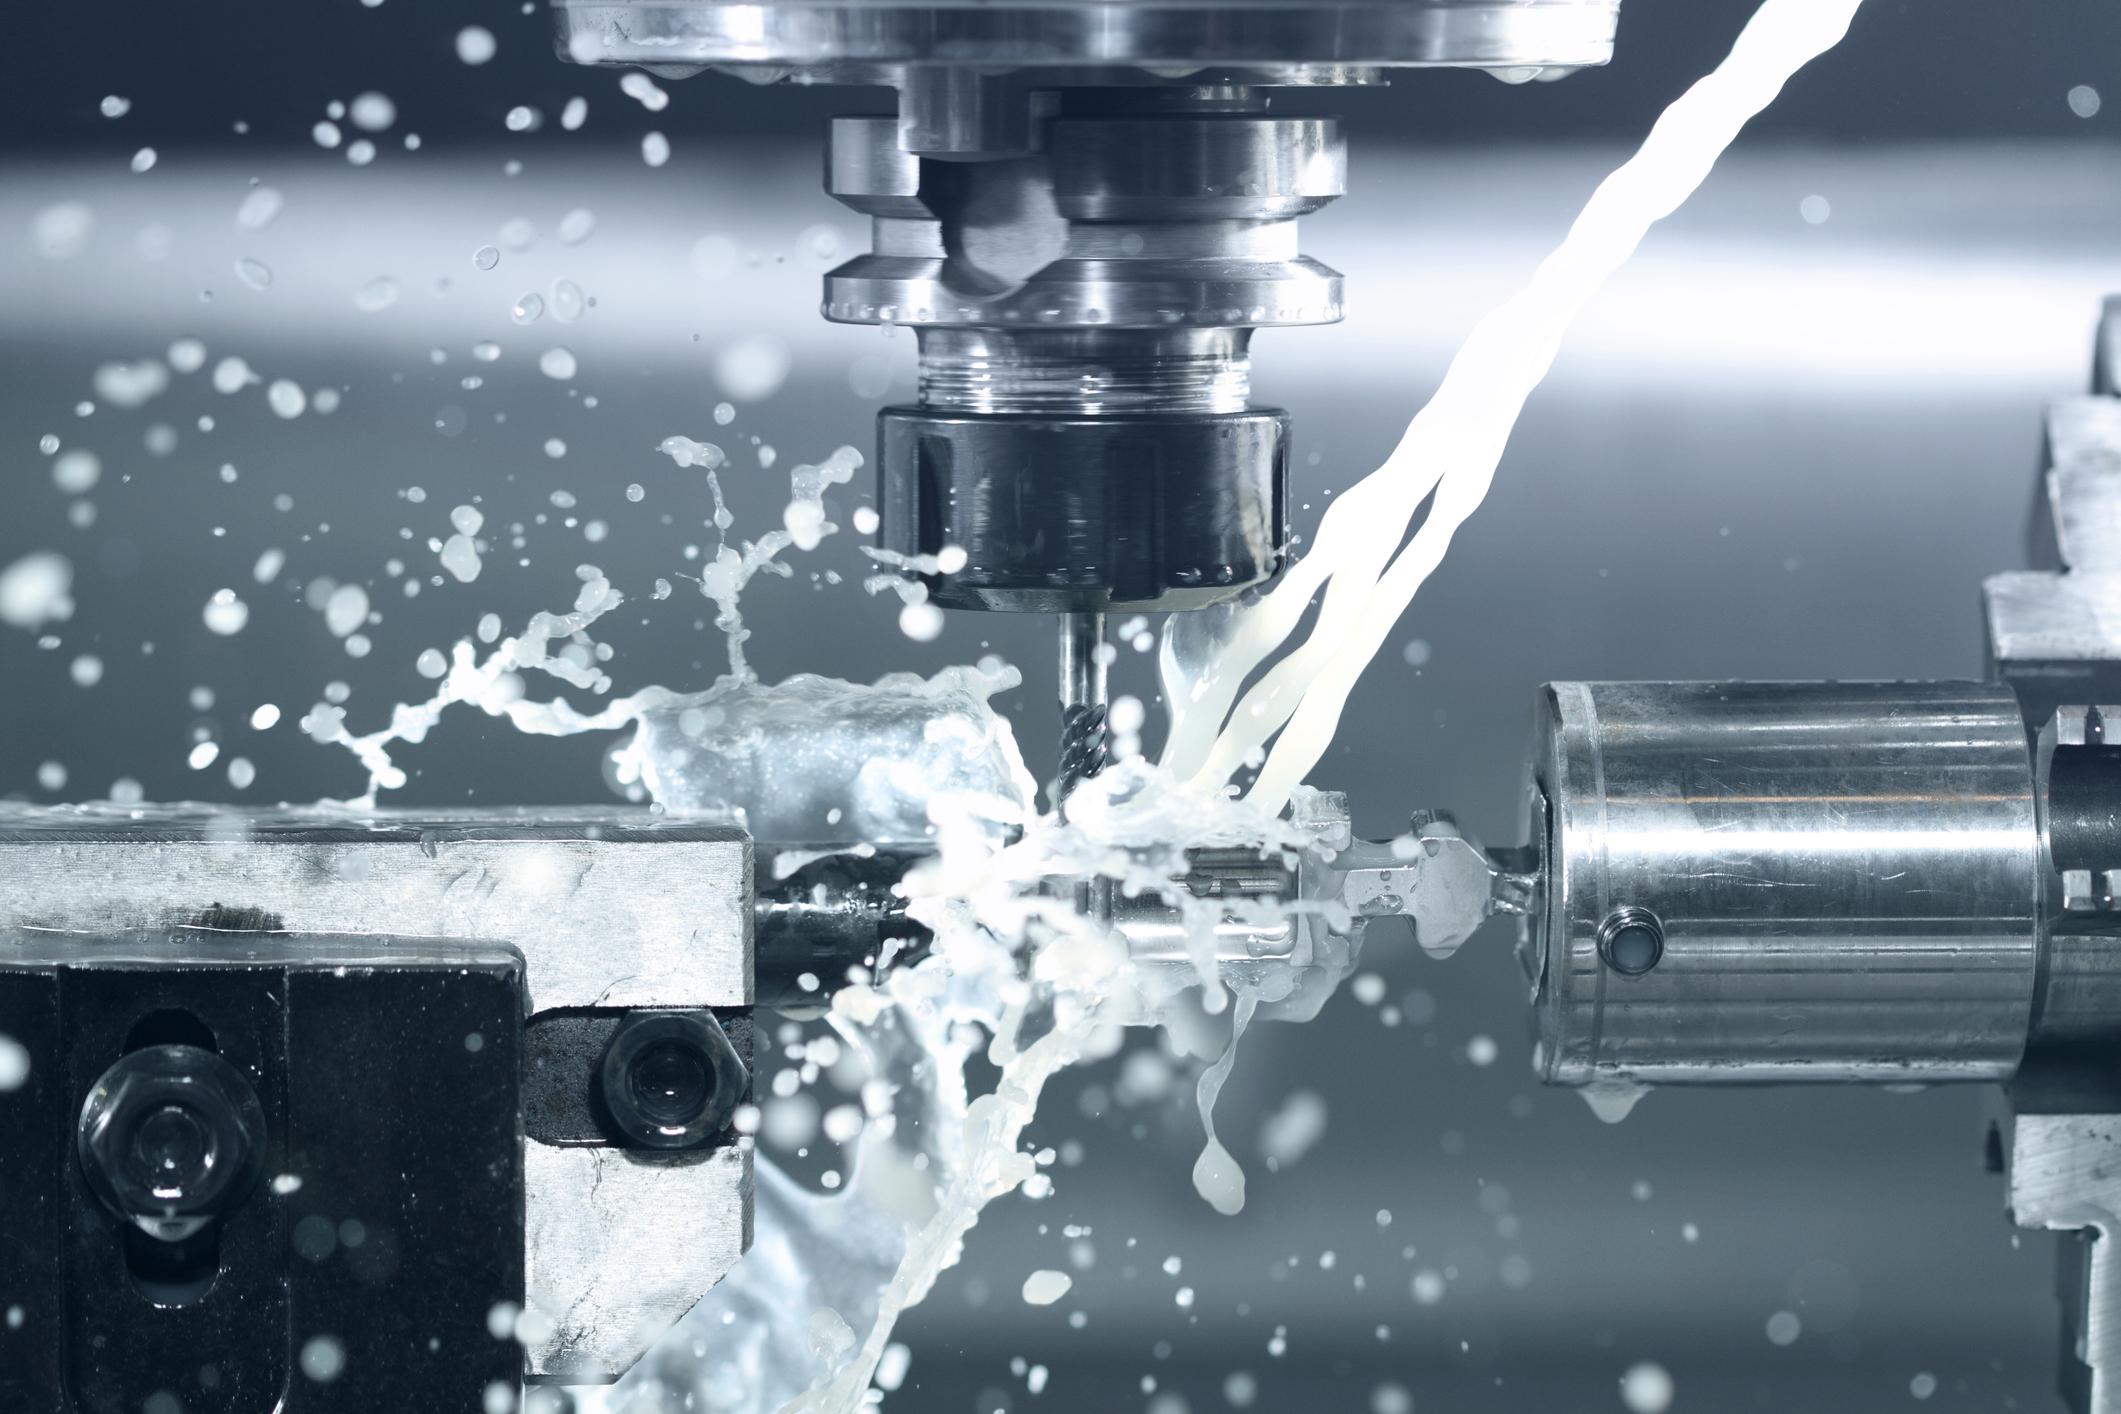 Close up of CNC machine processing